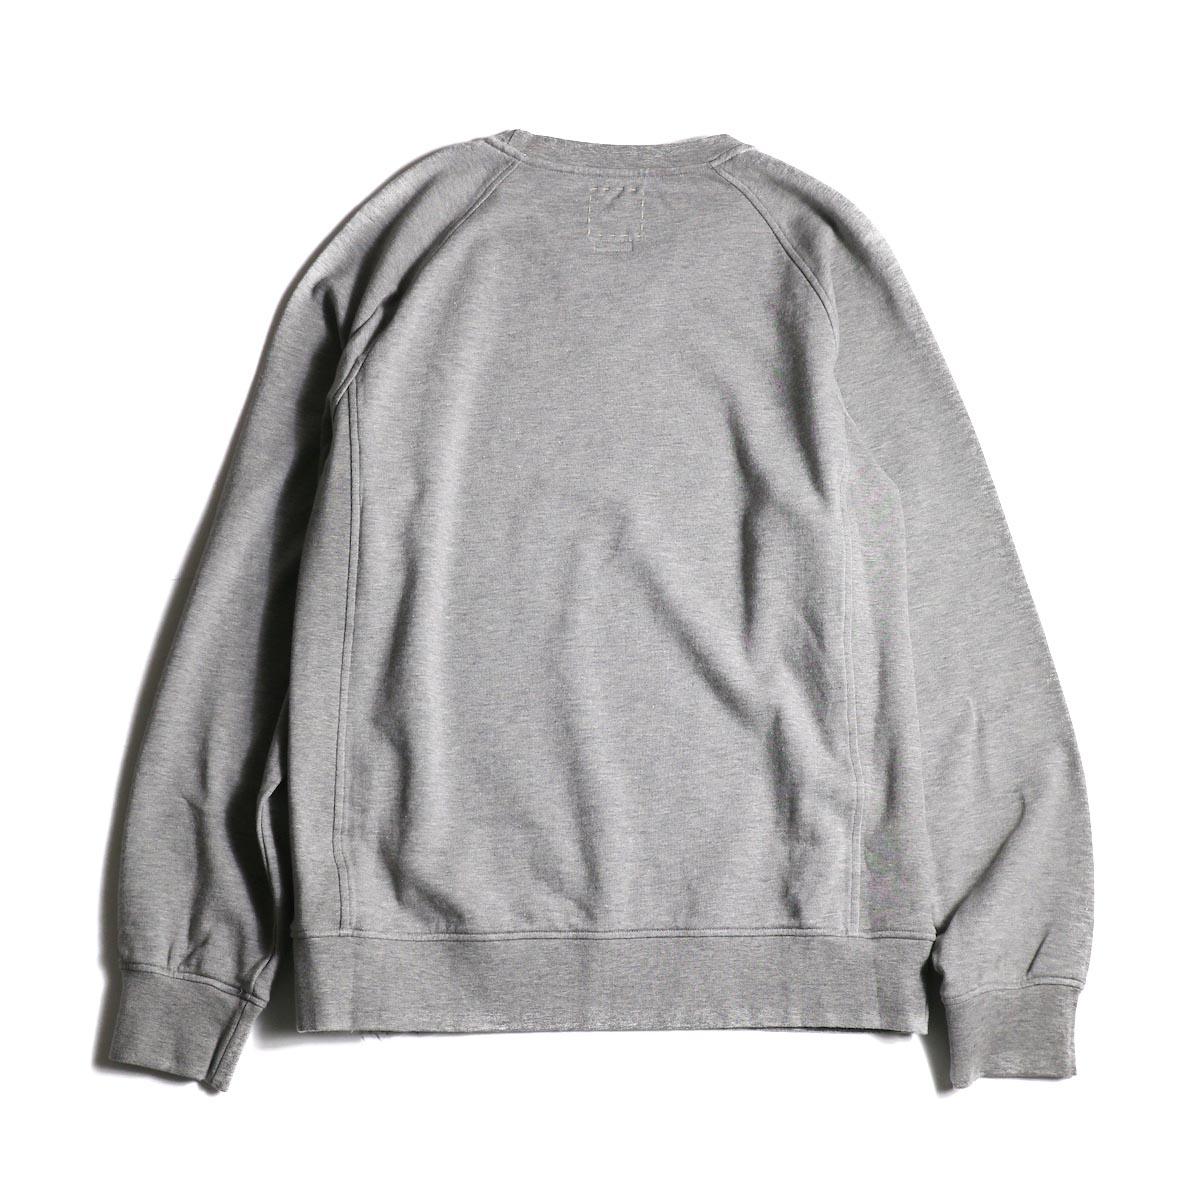 visvim / JV CREW L/S (Gray) 背面